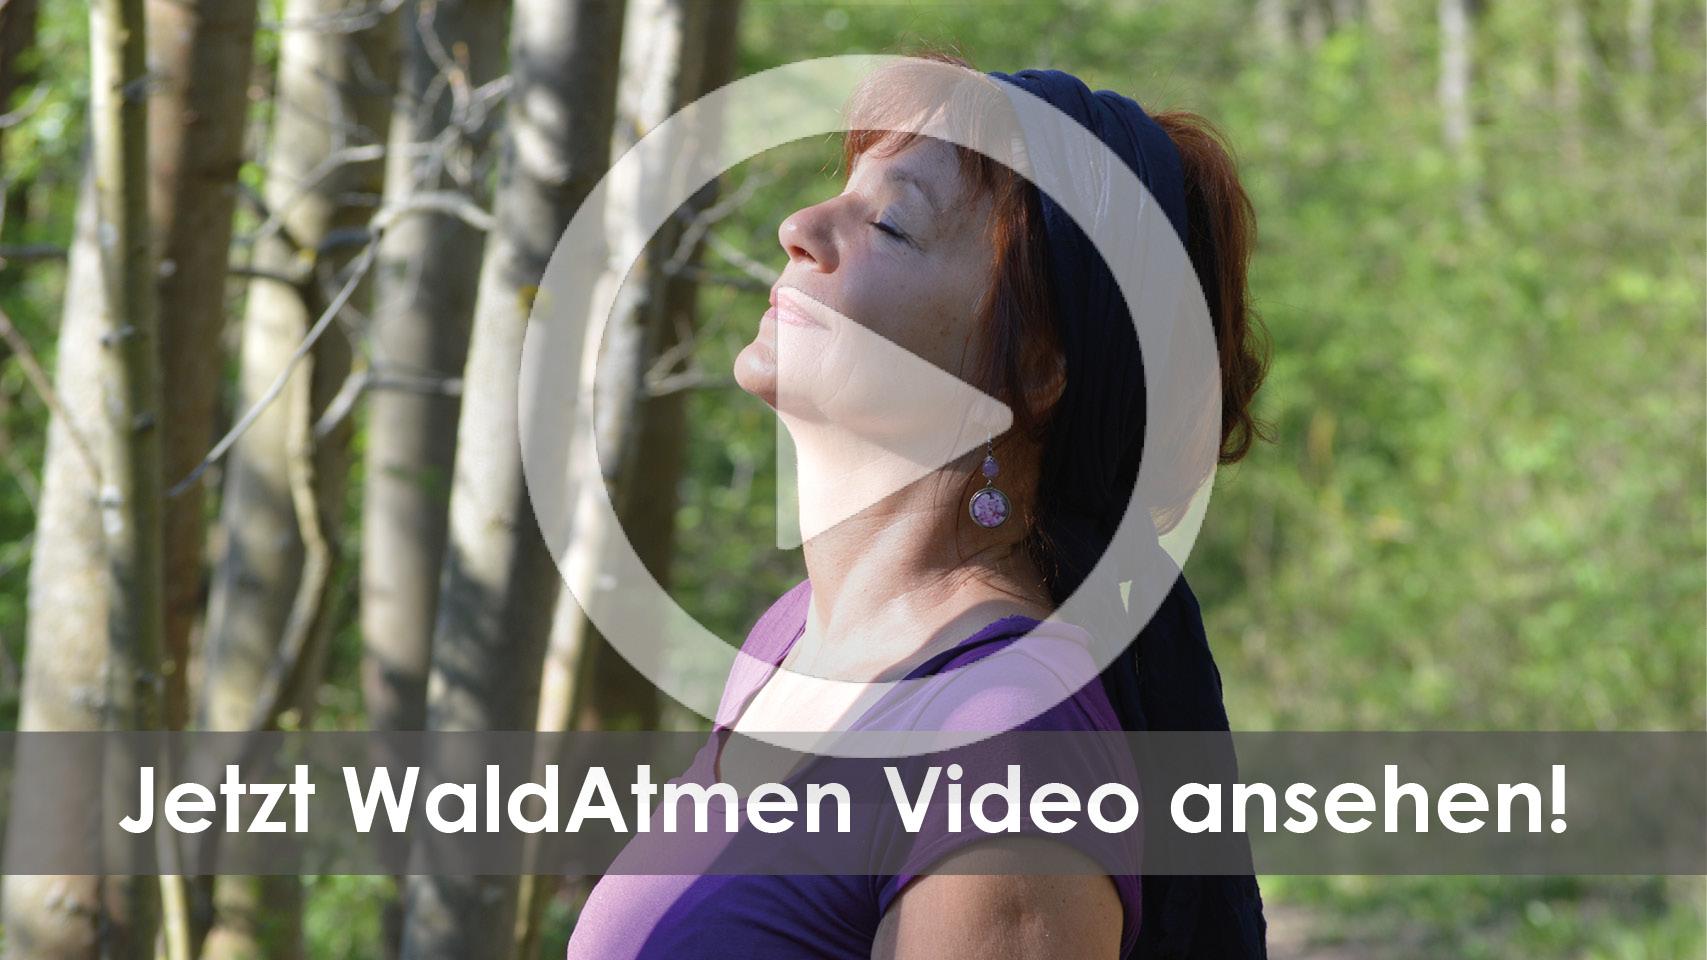 Waldatmen Video